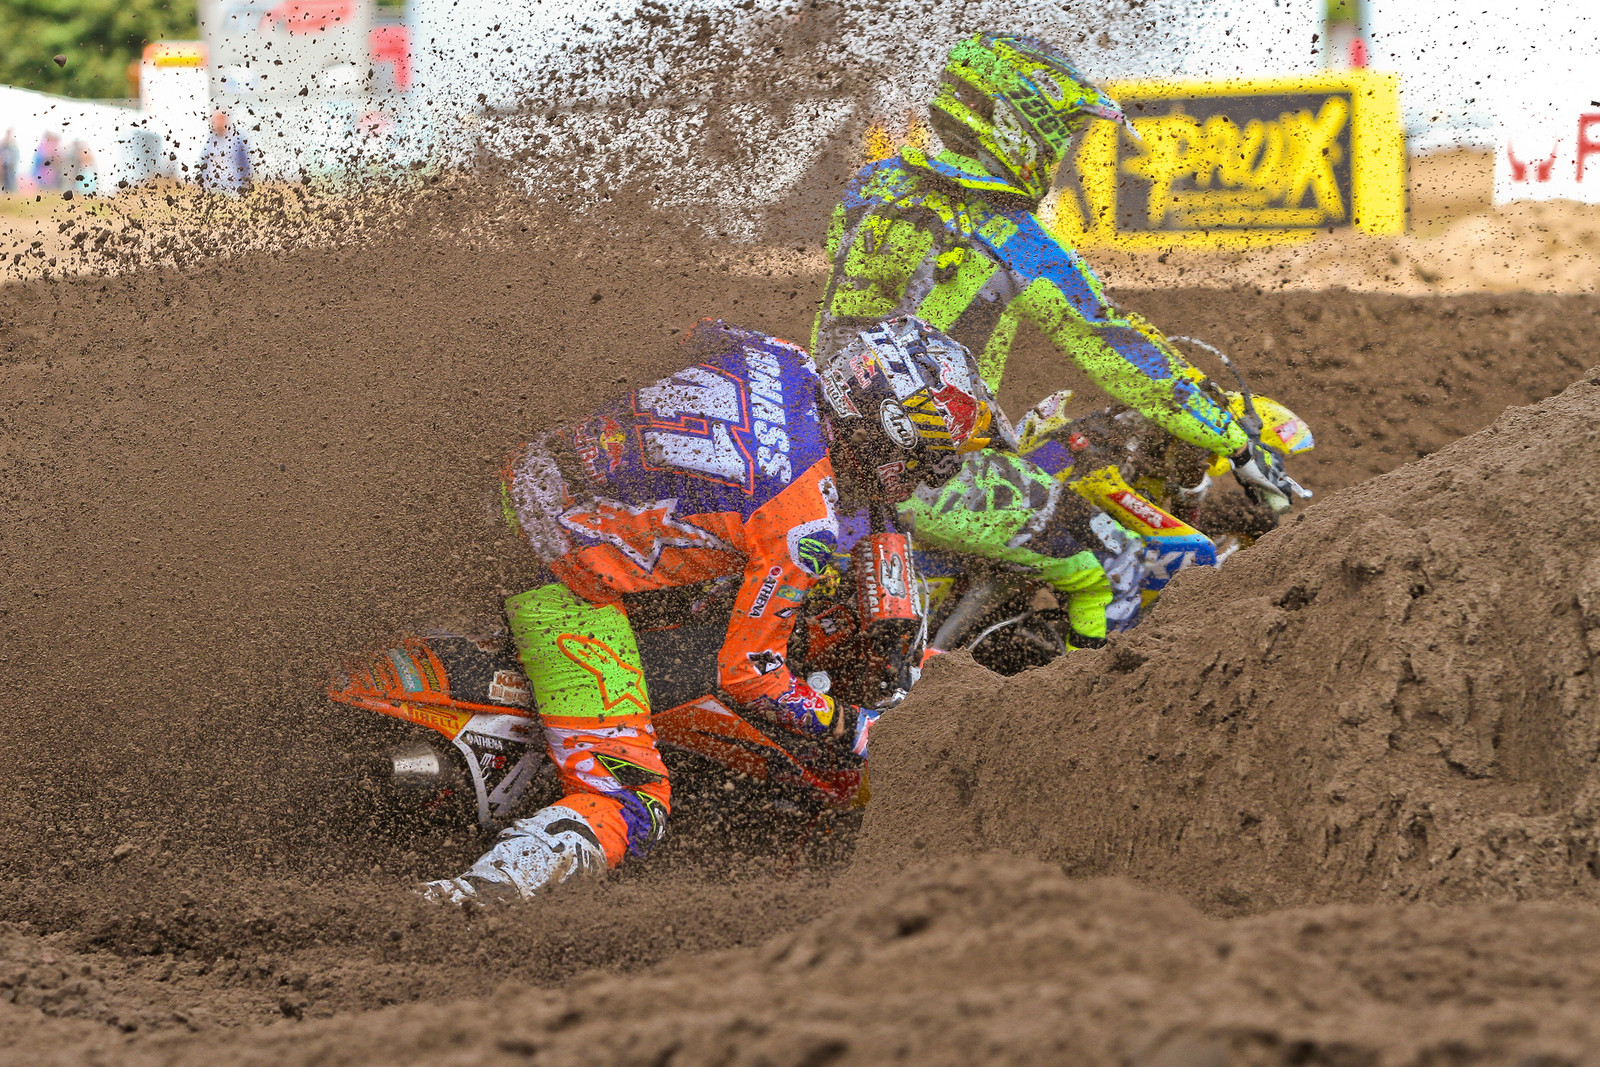 Pauls Jonass / Jeremy Seewer - ayearinmx - Motocross Pictures - Vital MX